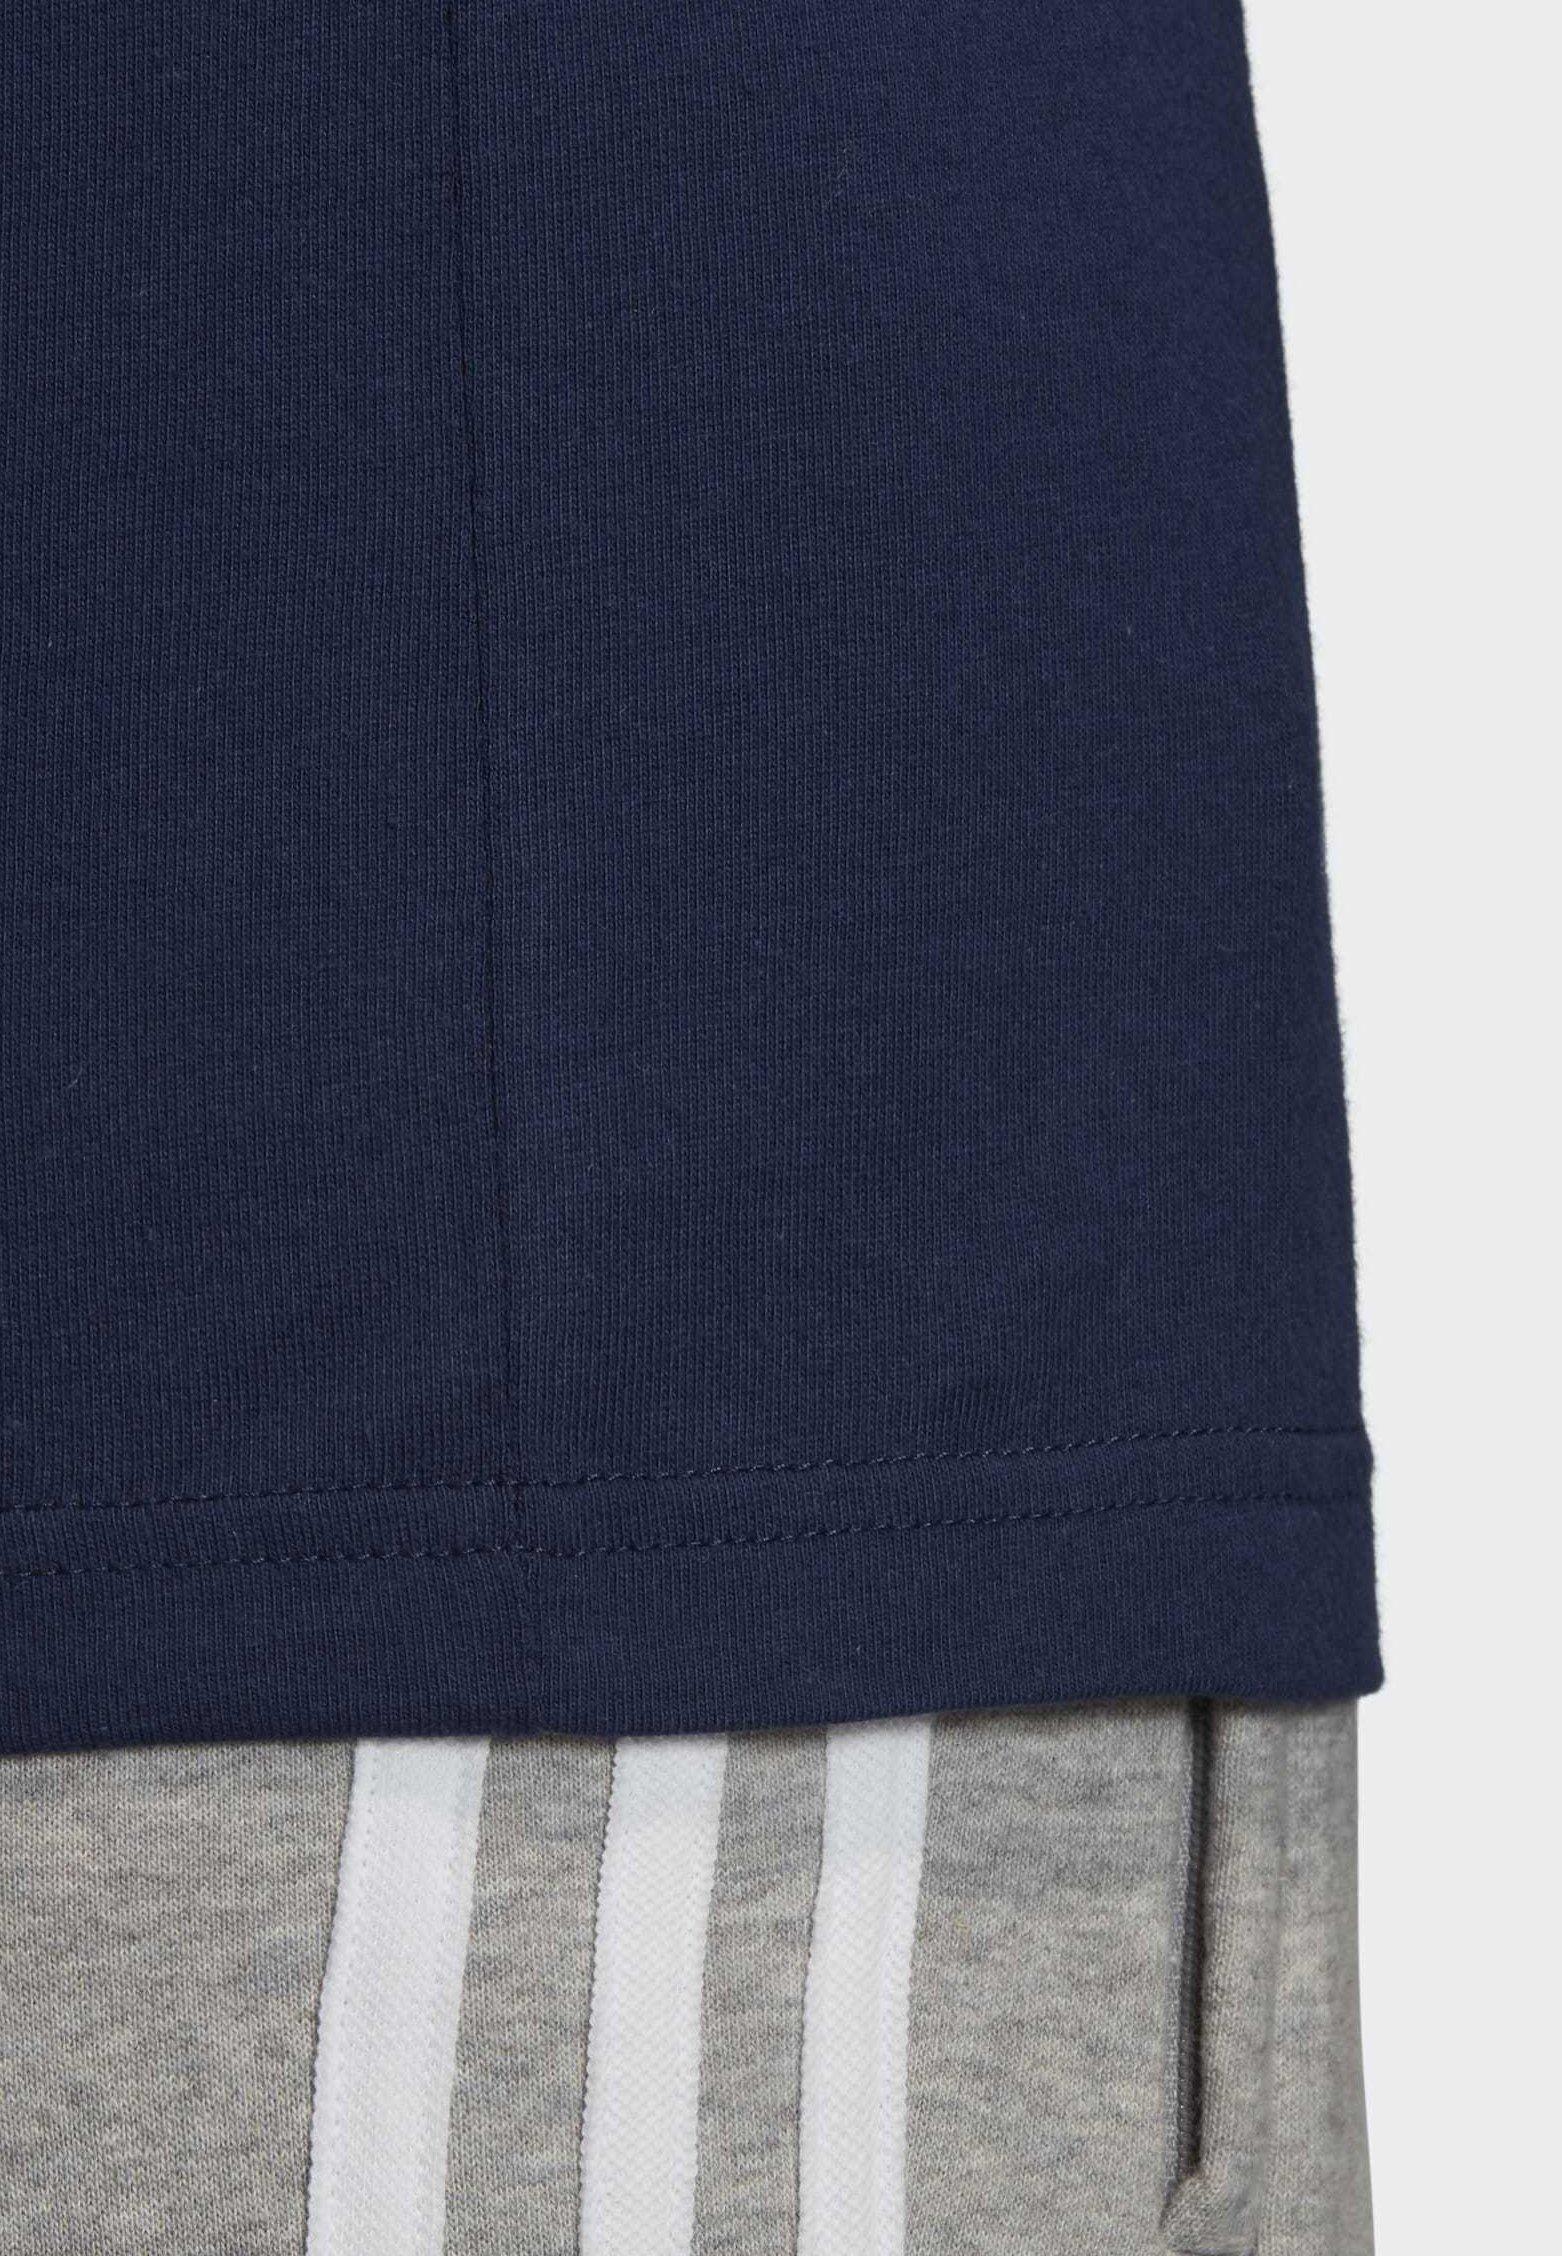 Adidas Originals Outline Trefoil T-shirt - Z Nadrukiem Blue